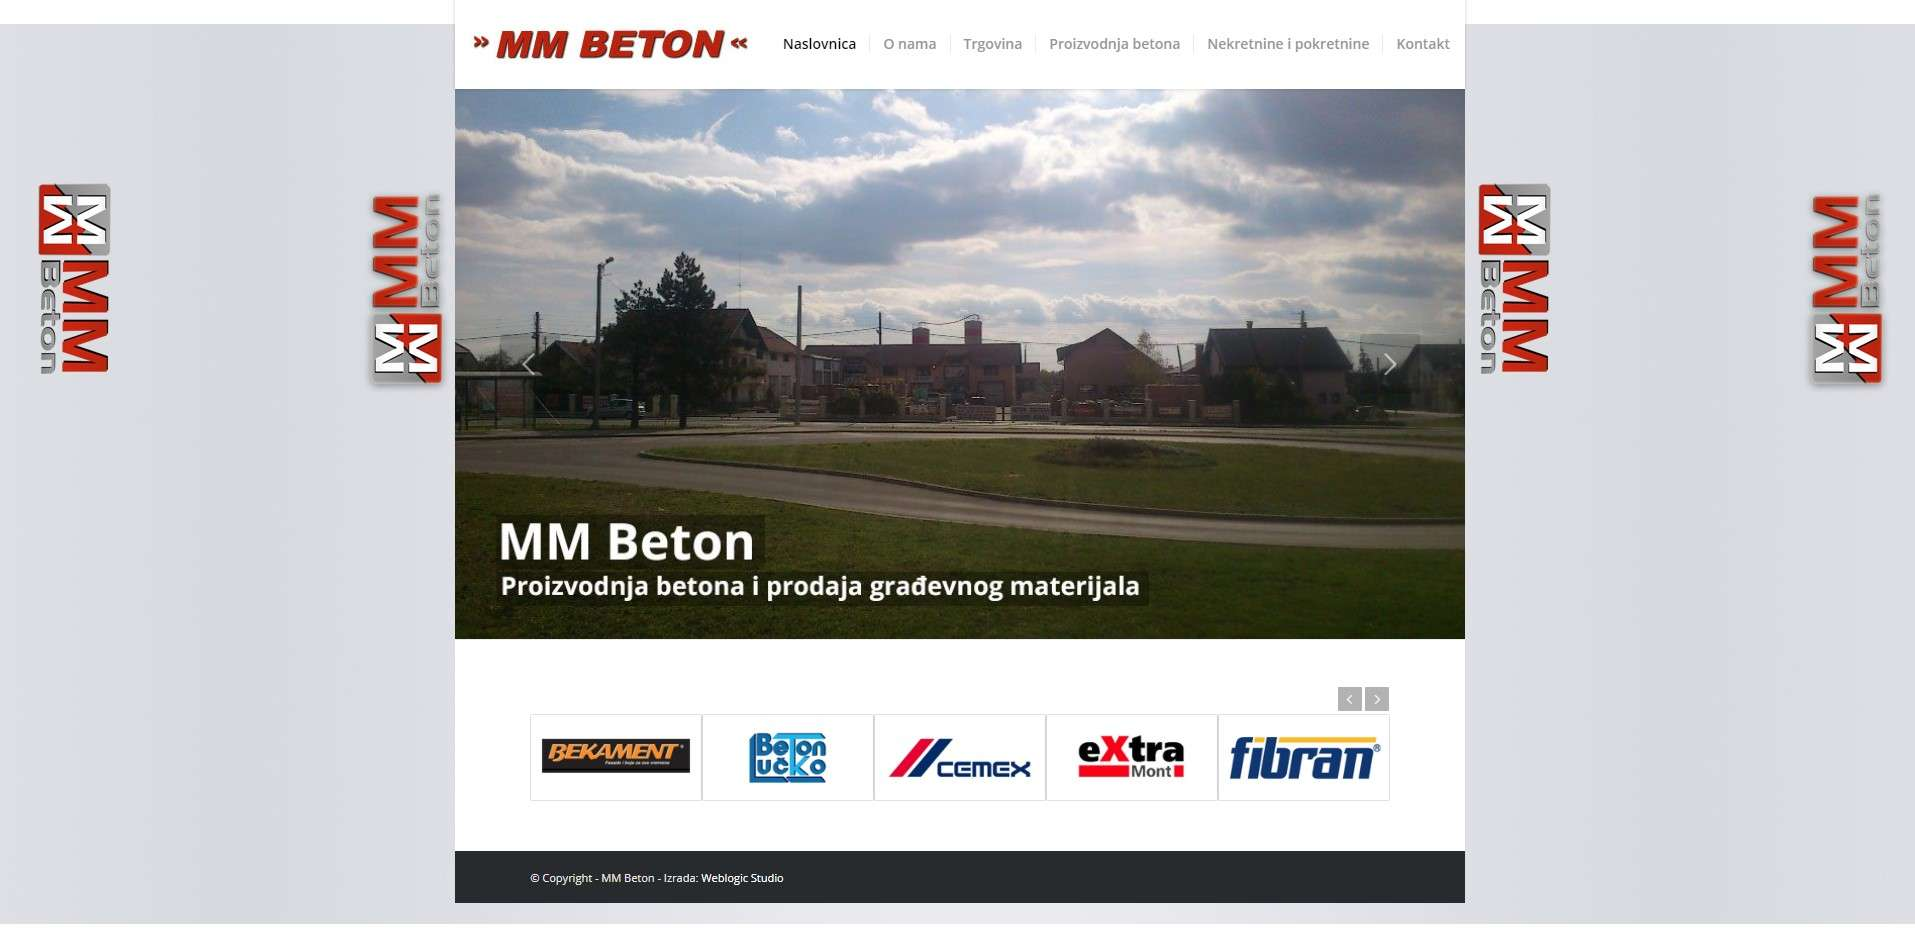 MM Beton